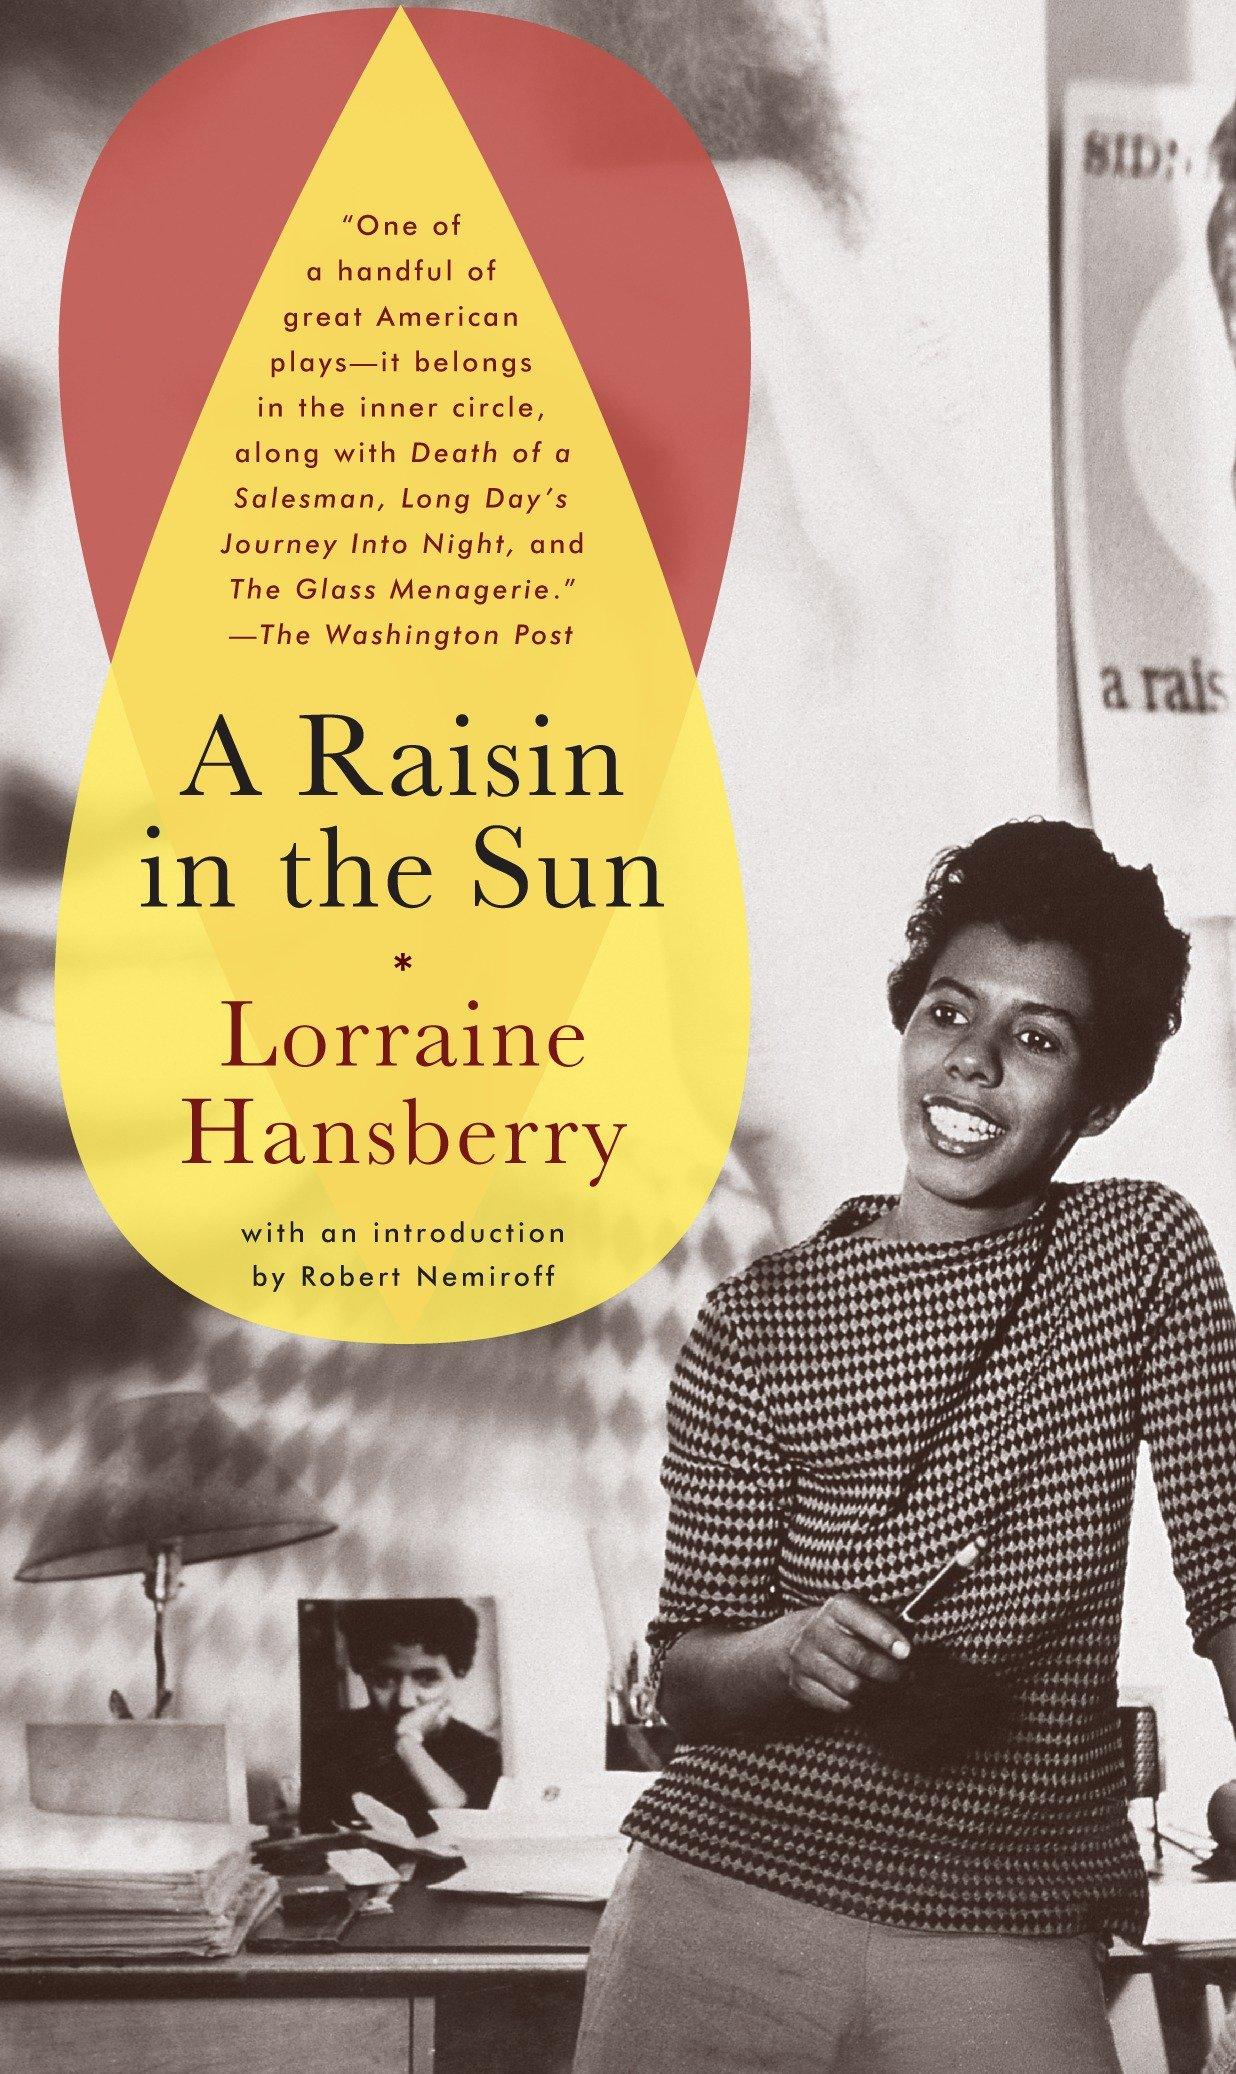 Cover Image of A Raisin in the Sun